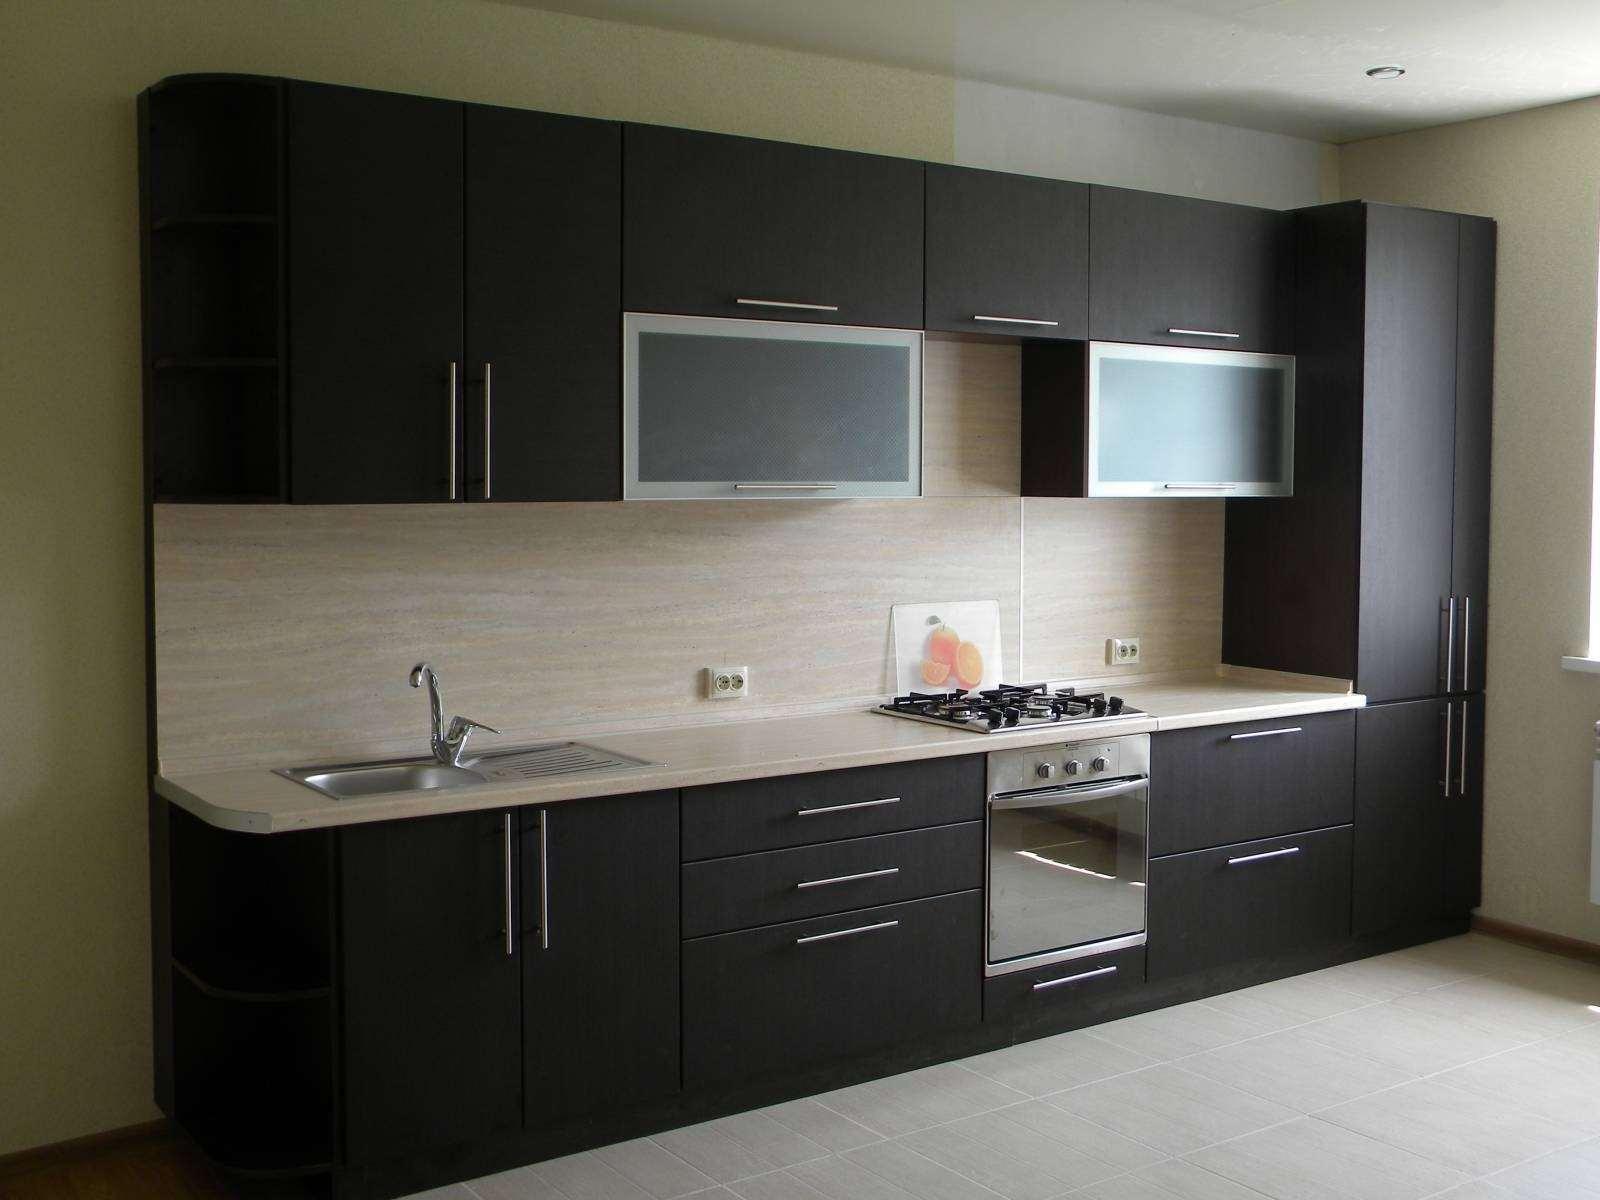 Кухонный гарнитур цвета венге